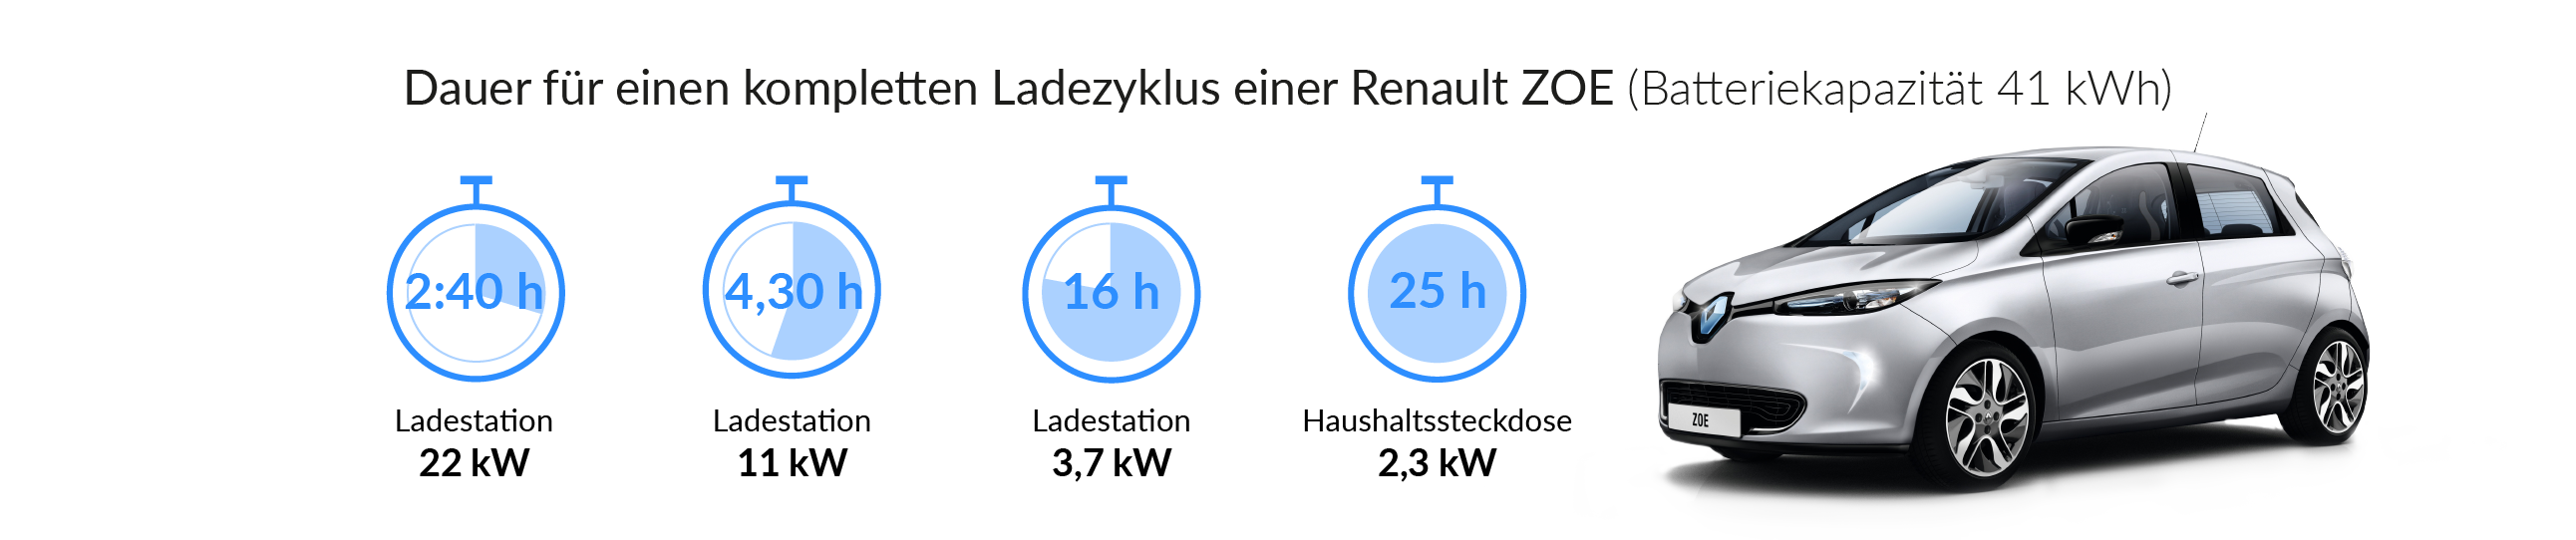 Ladezeiten des Renault ZOE